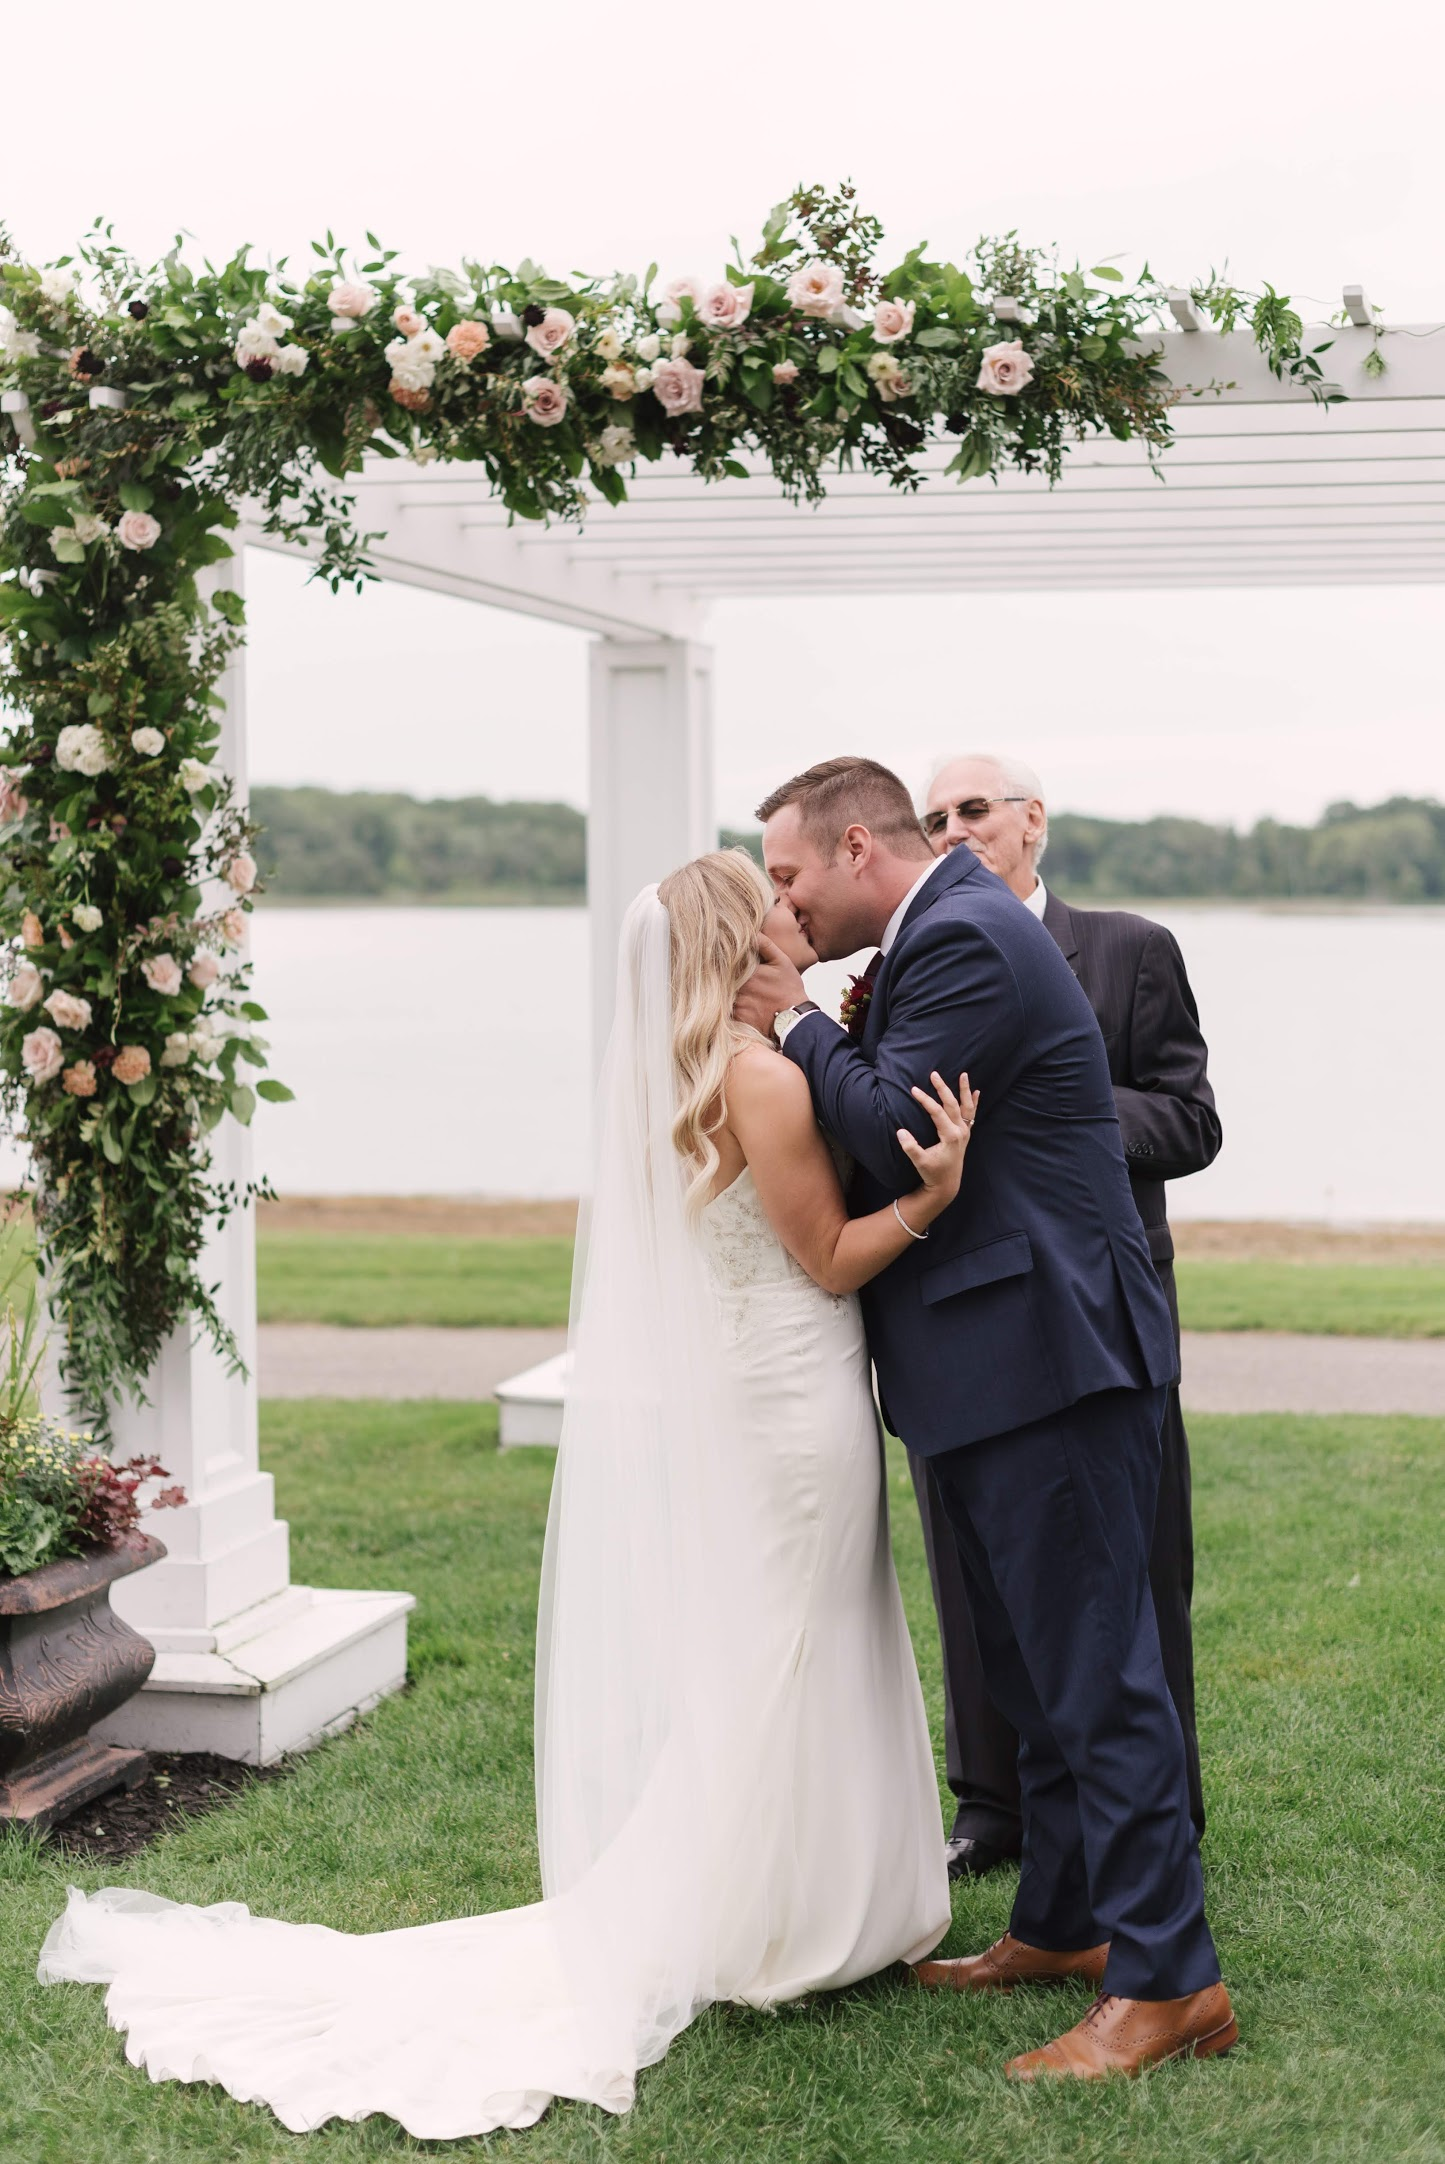 Field-Gems-Photography-Detroit-Michigan-Wedding-Photographer-Family-Photographer-Photobooth-090818-714.jpg